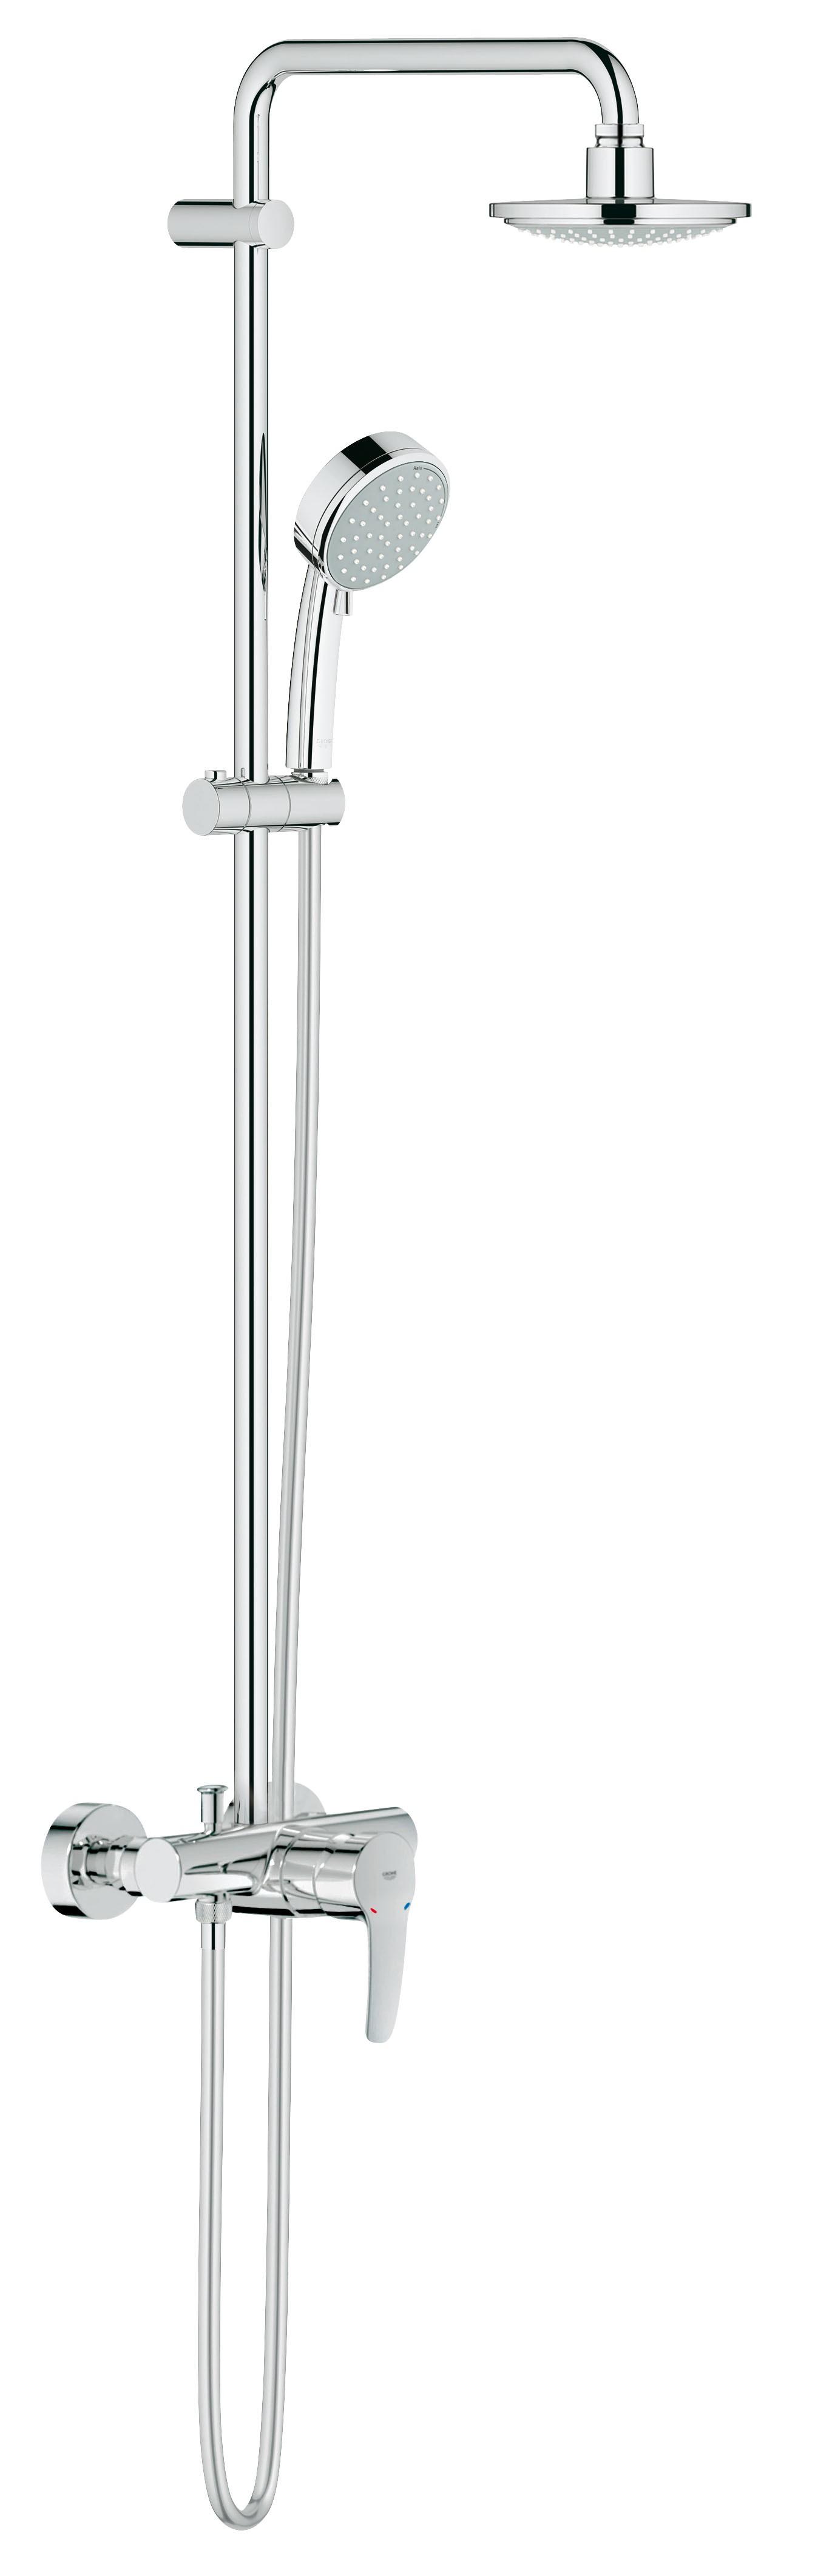 Grohe 26224000 Tempesta Cosmopolitan 160 с верхним и ручным душем, хром